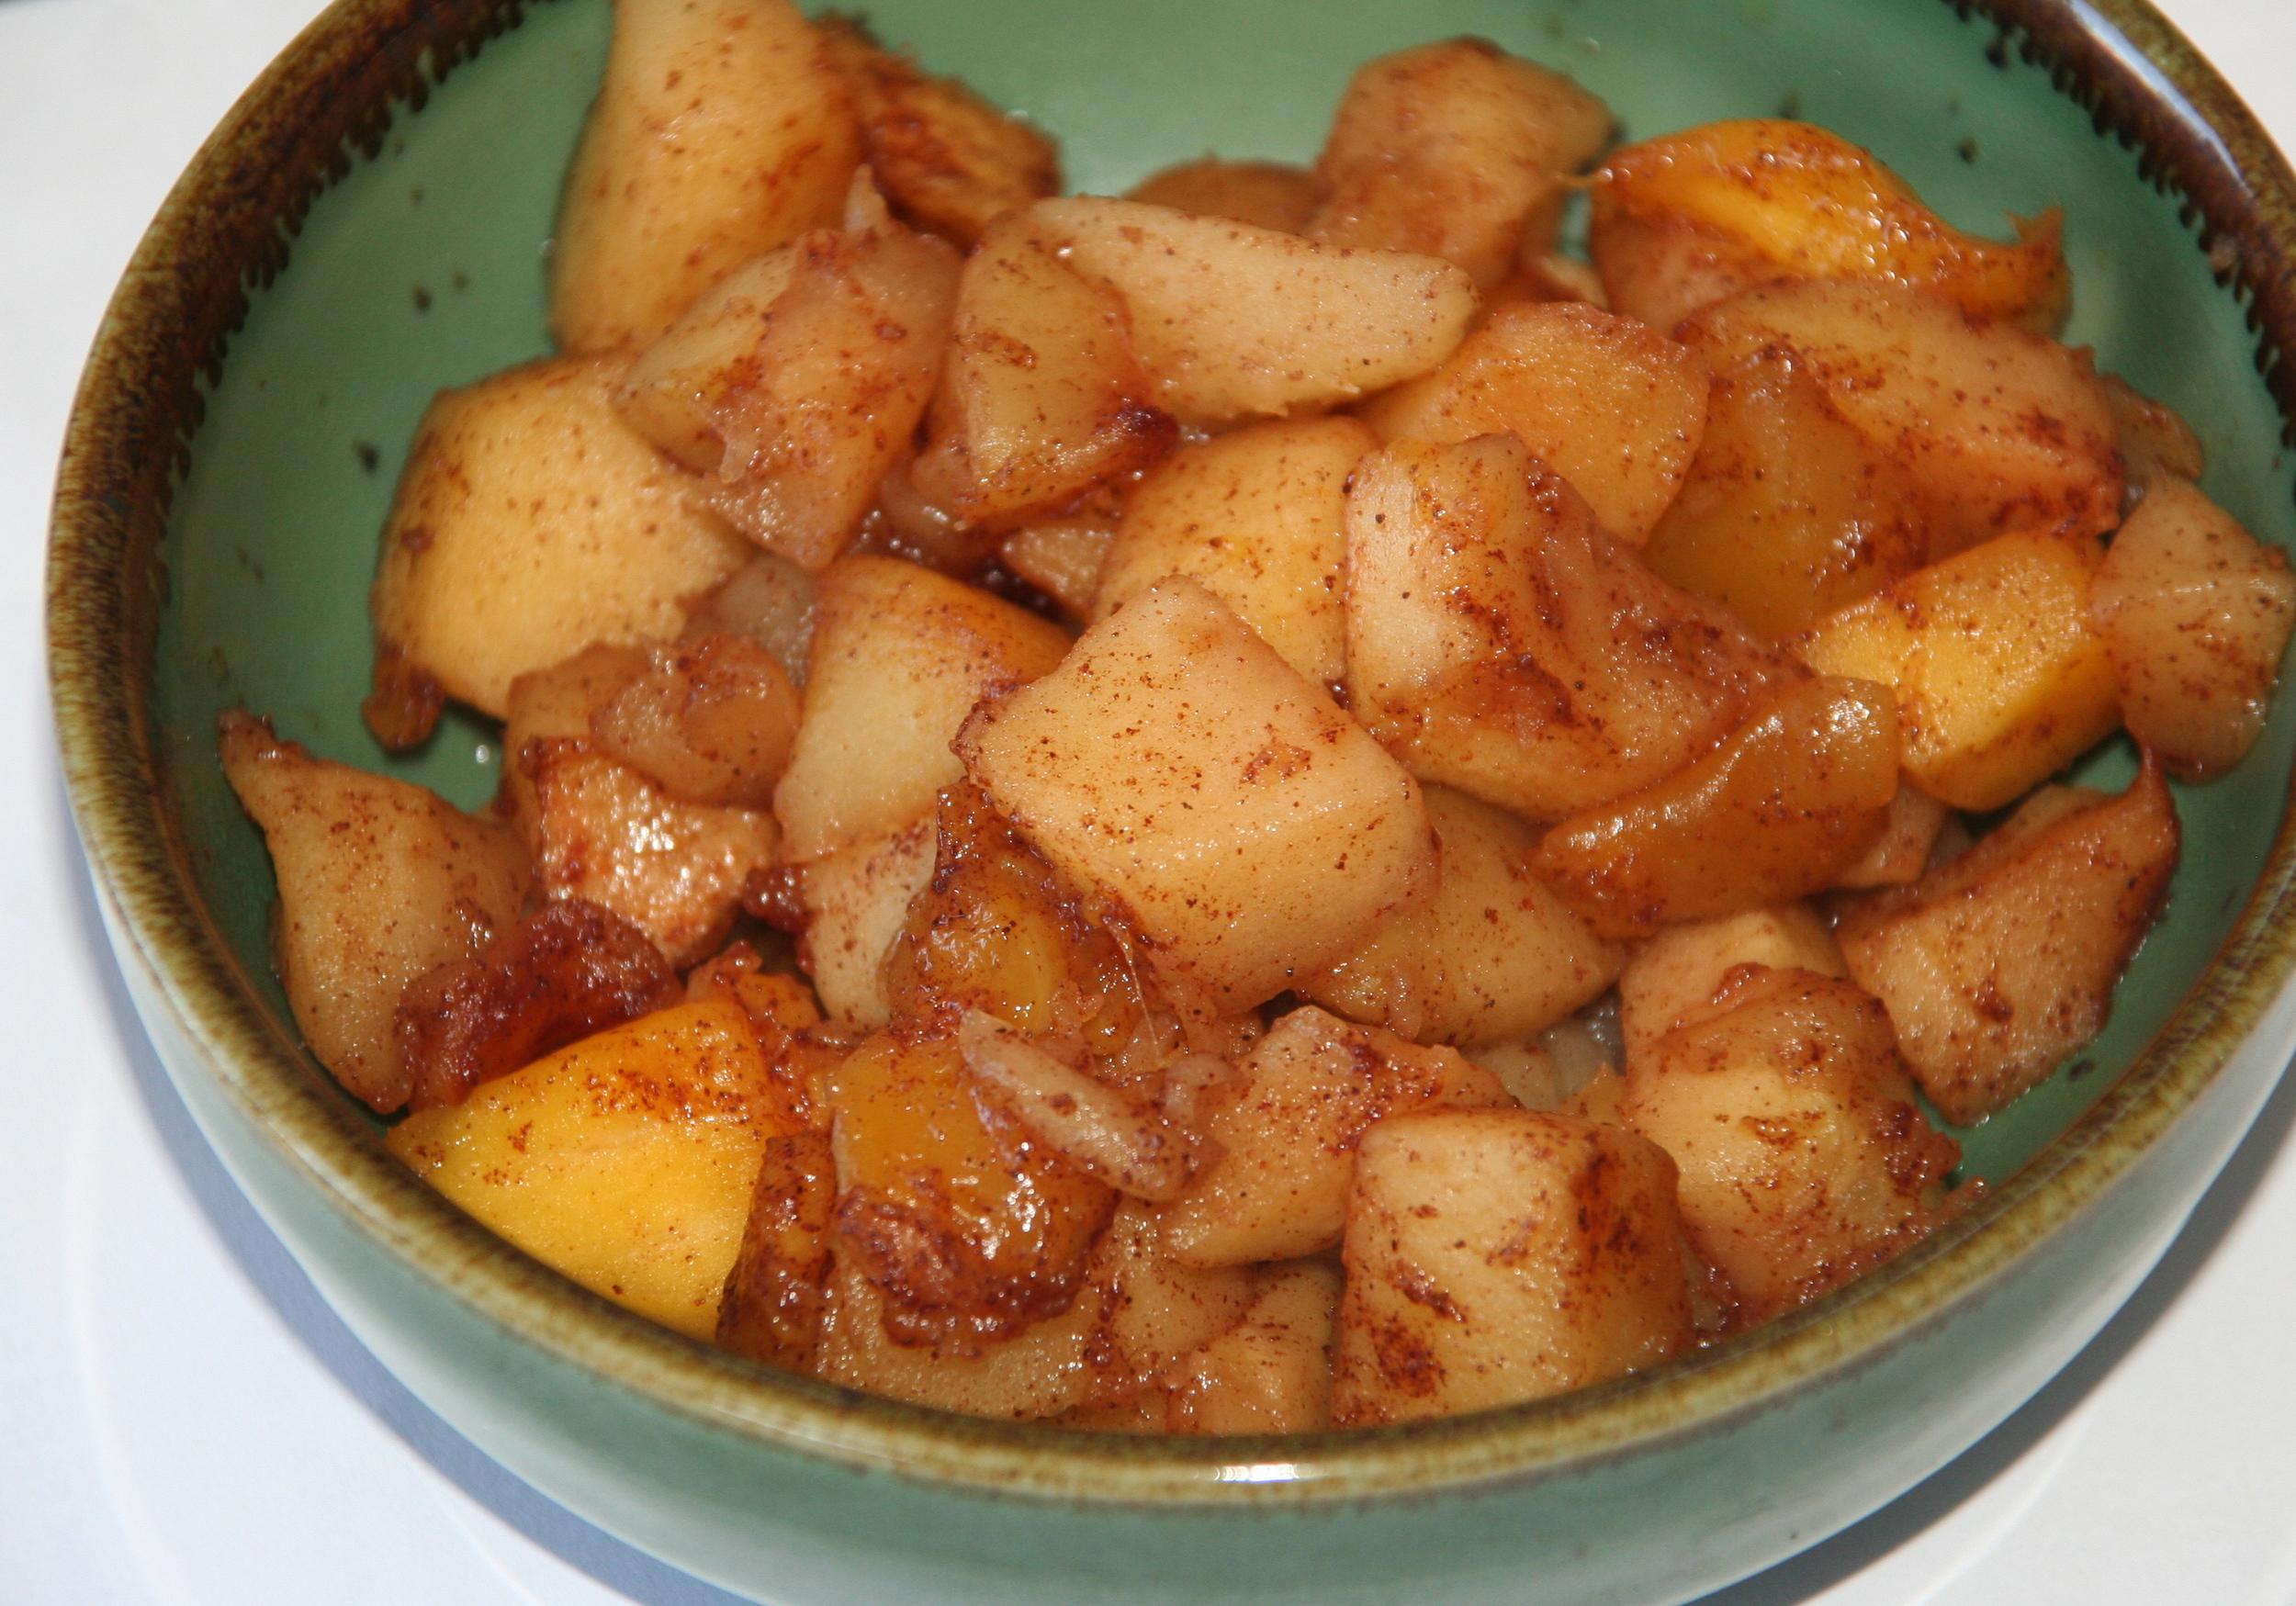 Homemade chunky apple-mango sauce